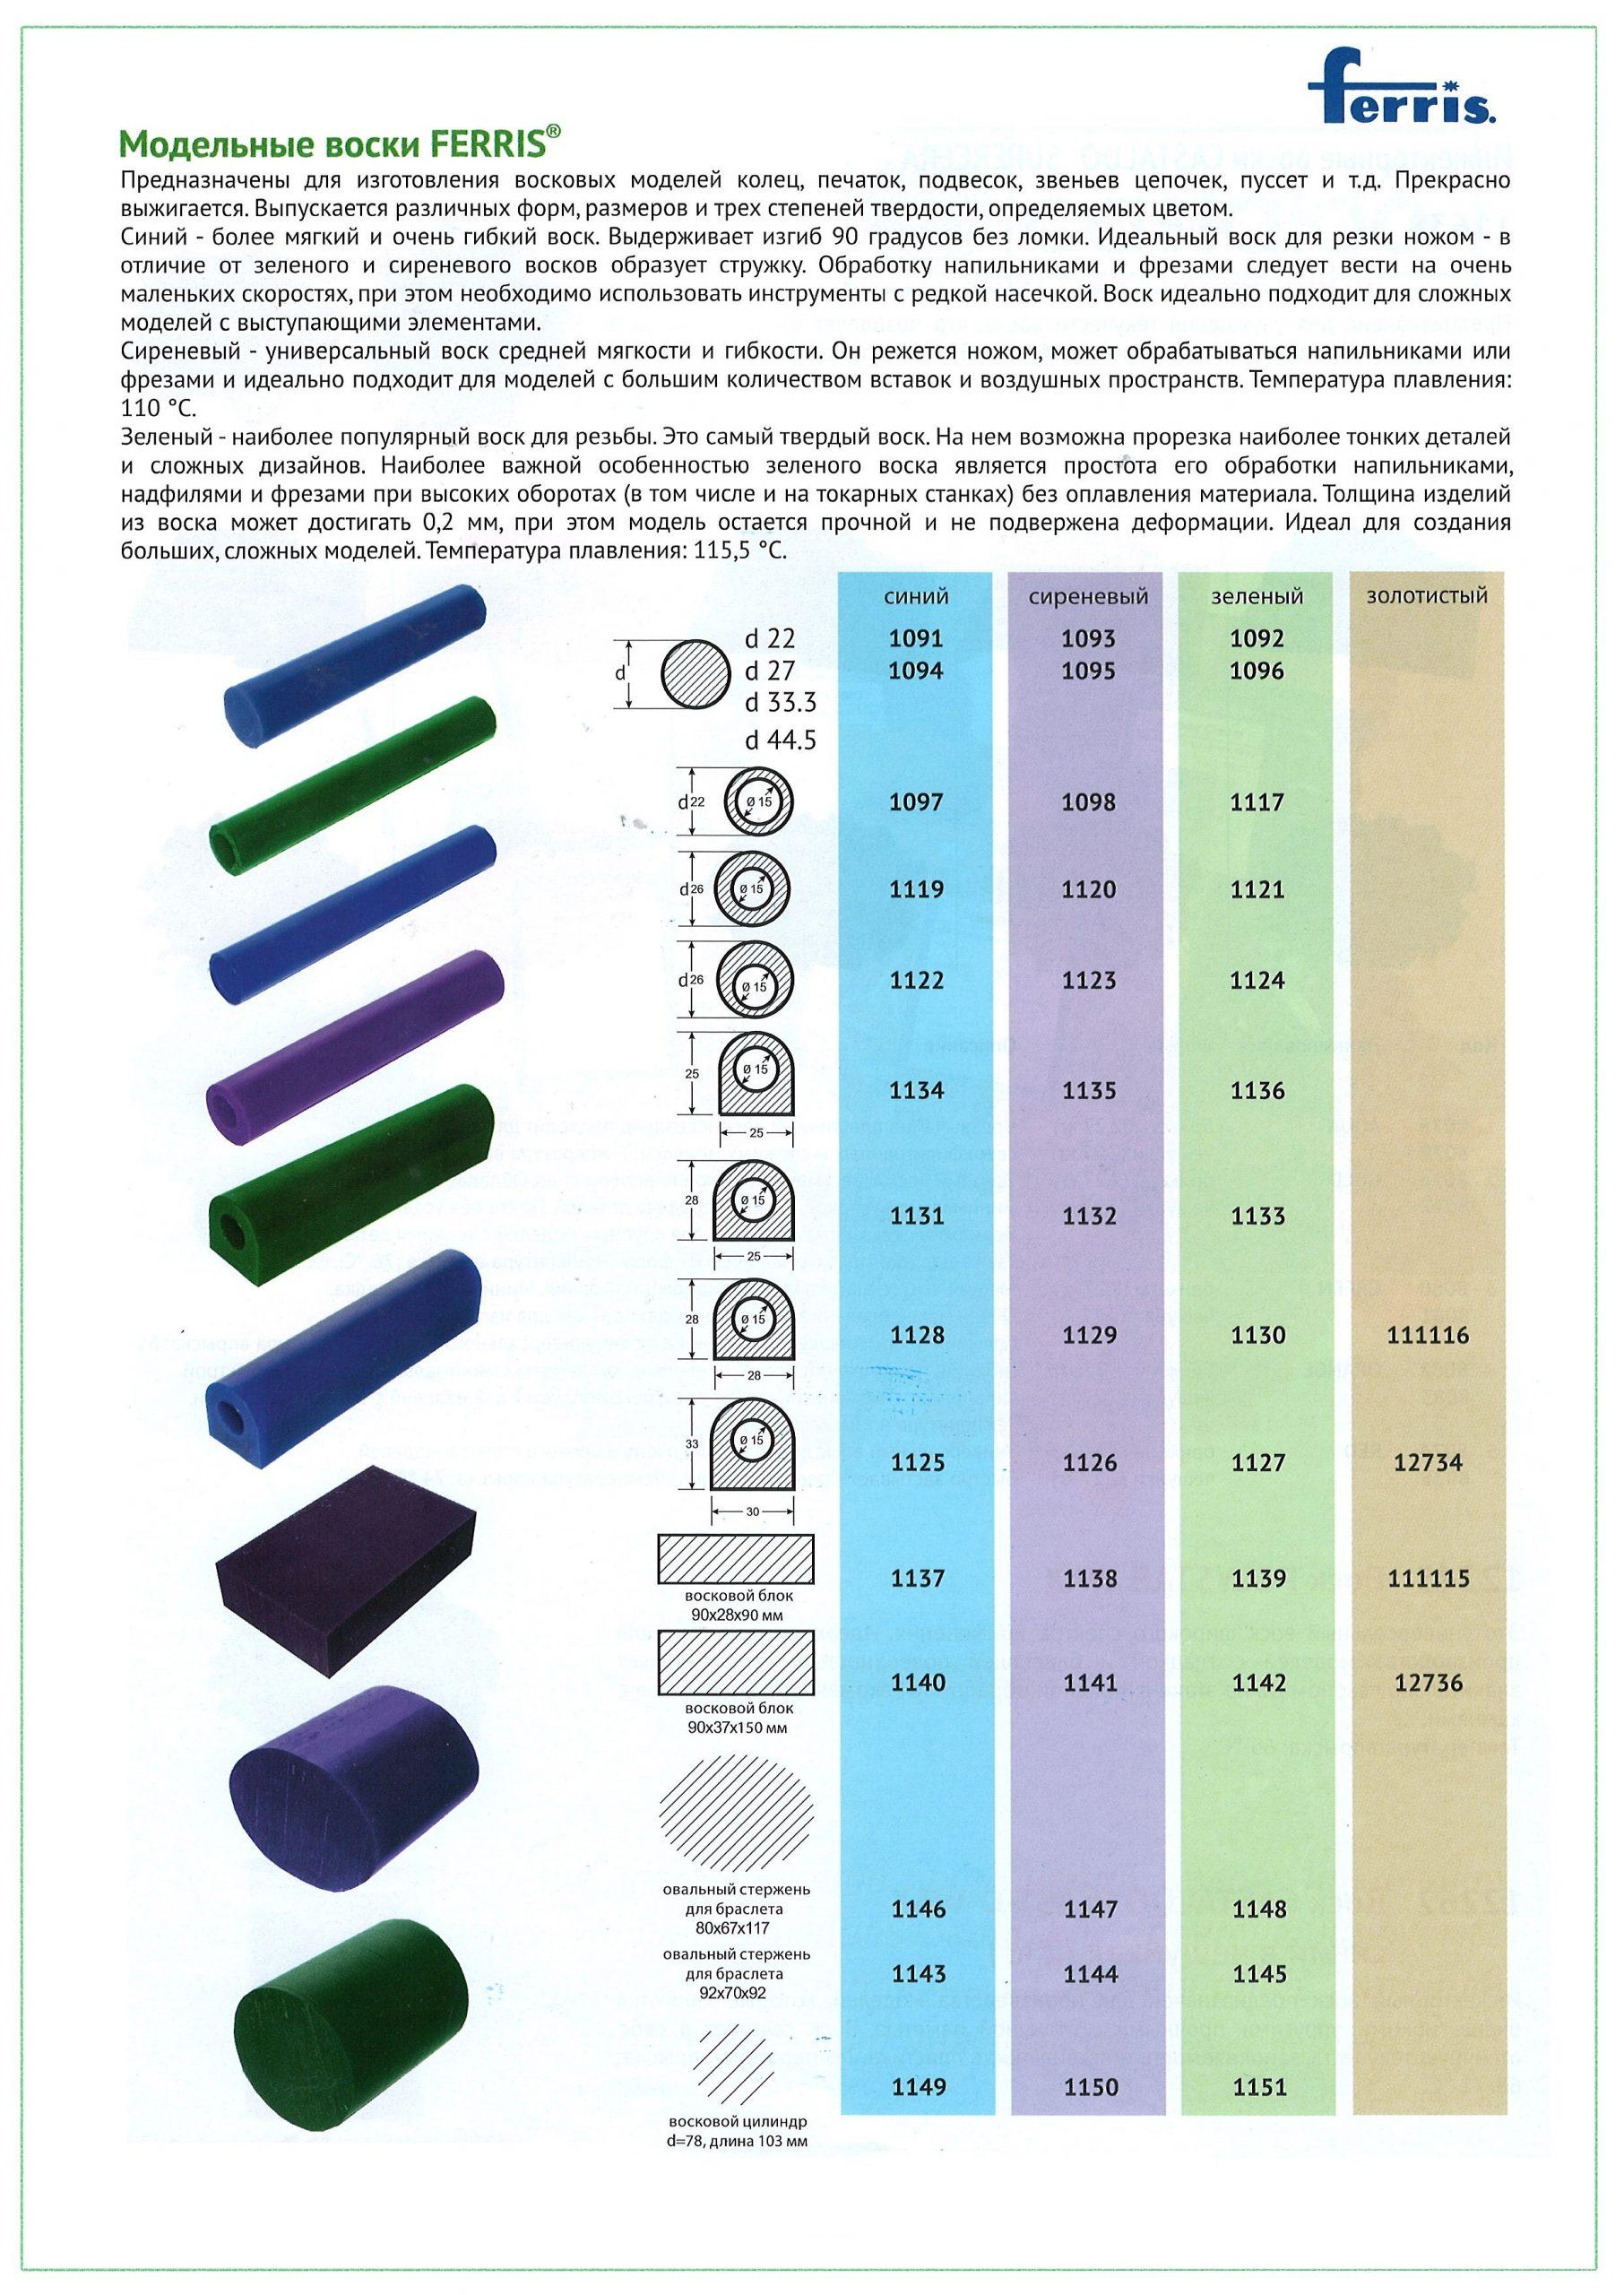 Воск модельный FERRIS FILE-A синий брусок (90х90х28мм), 227 гр